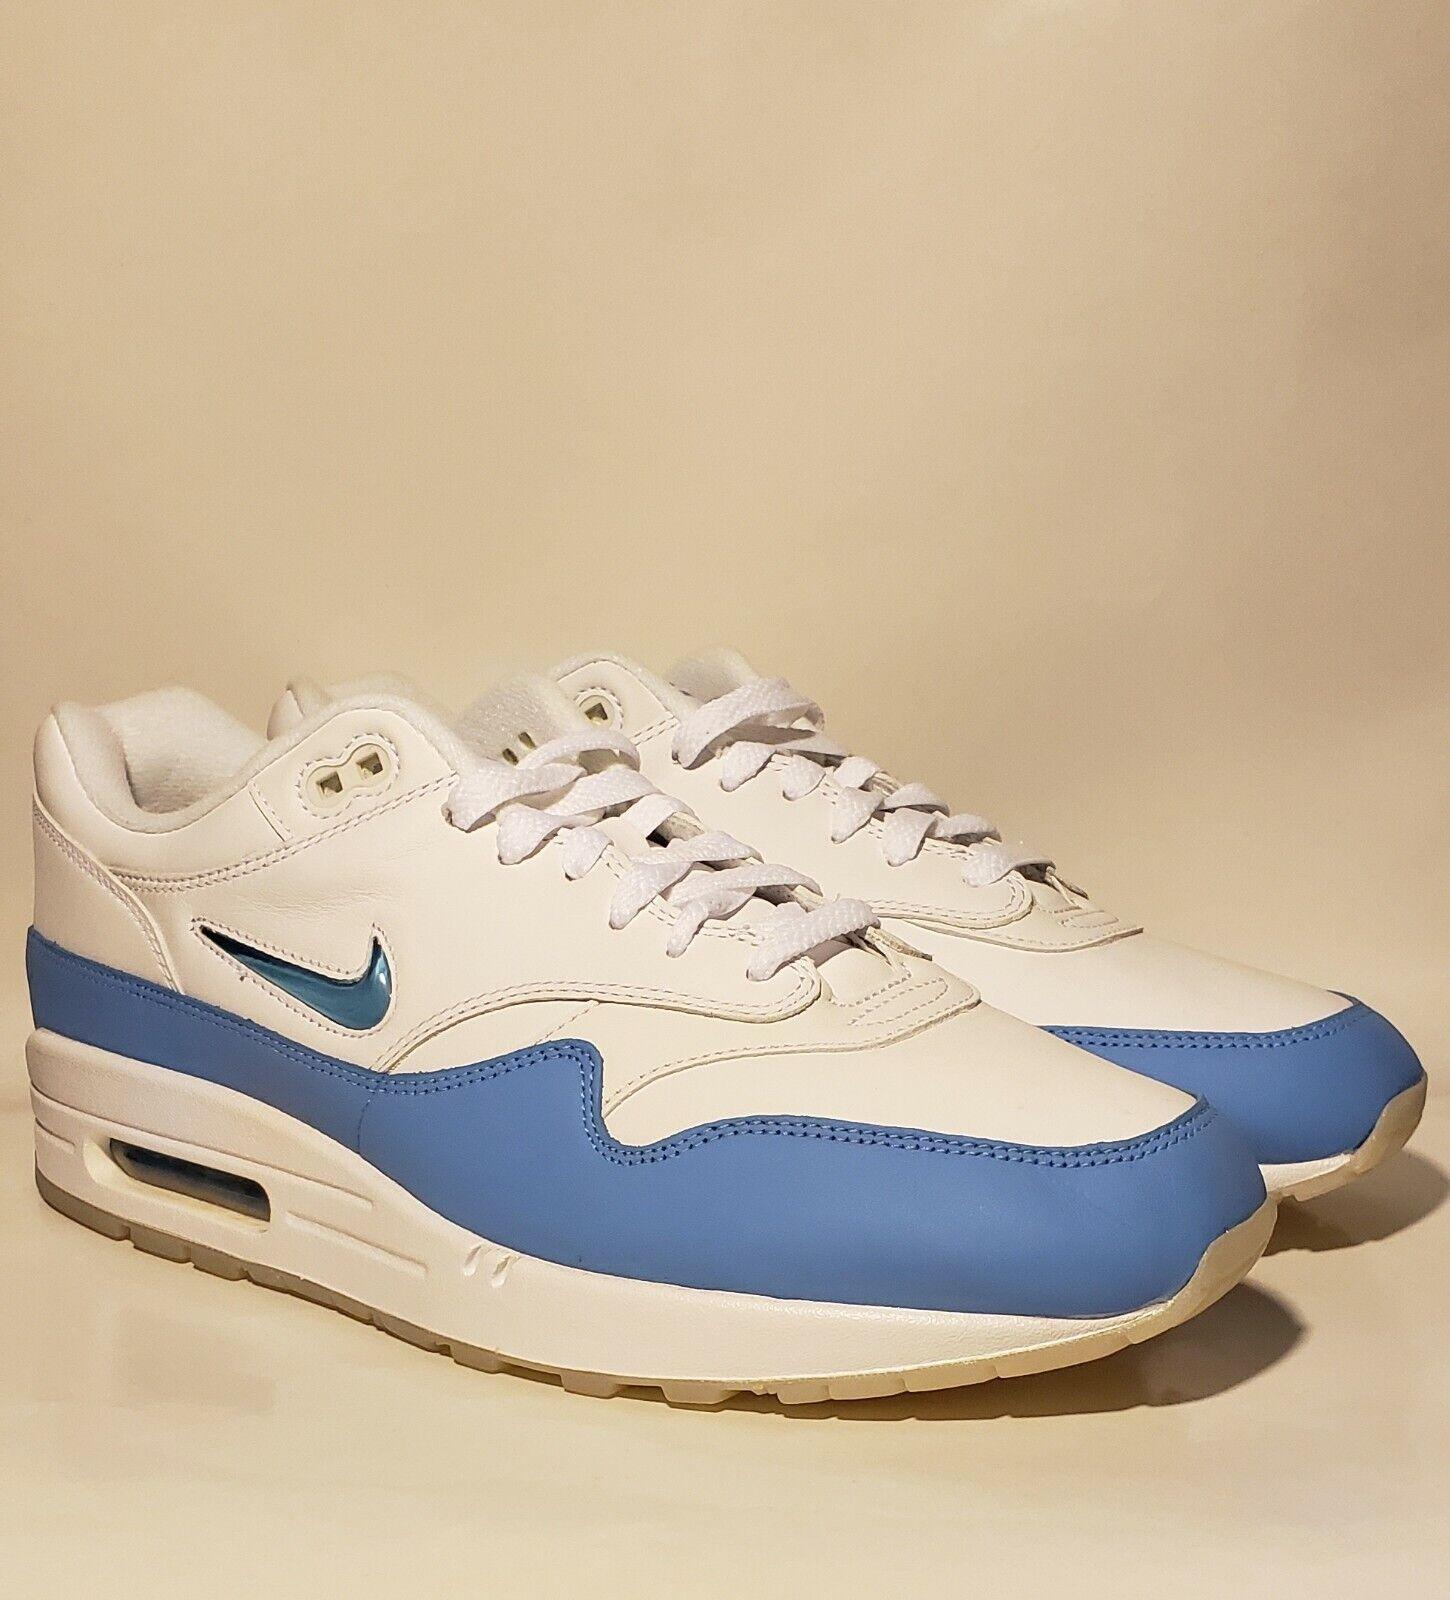 Nike Air Max 1 Premium SC Jewel University Blue 918354 102 US Size 12